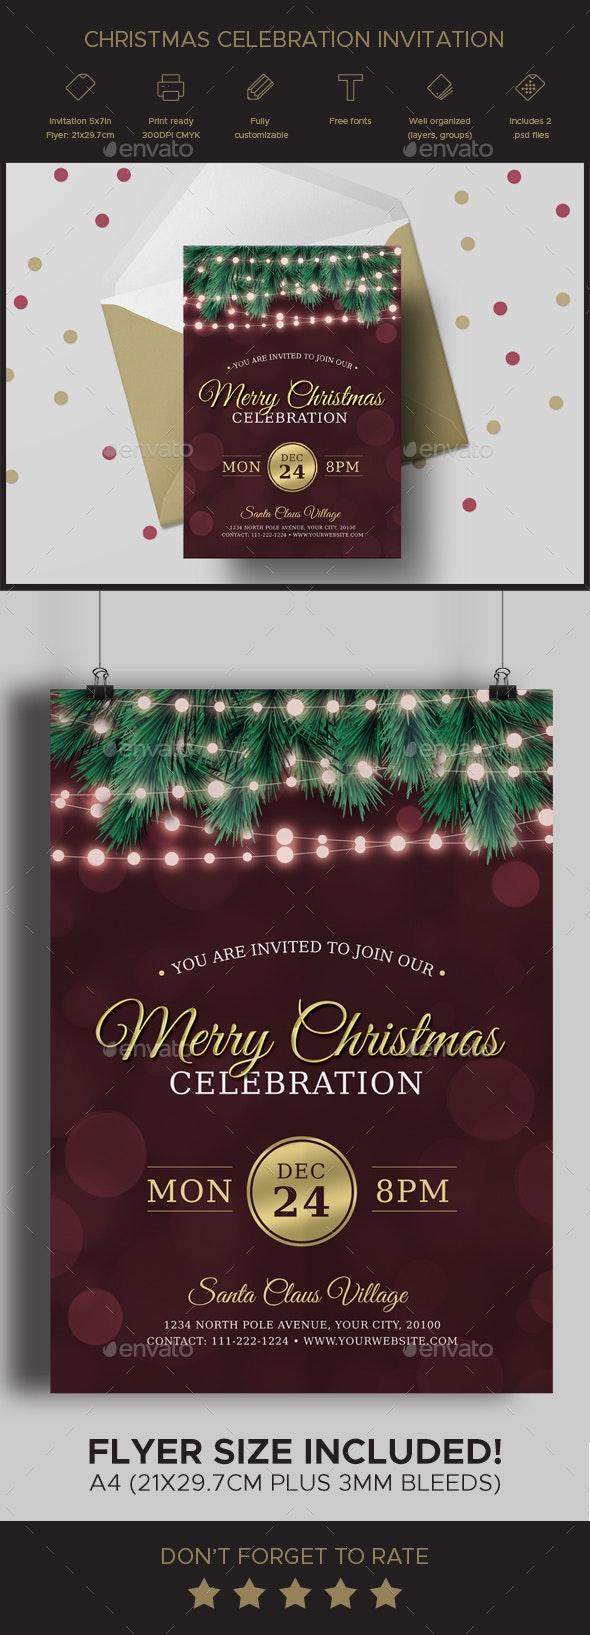 Christmas Celebration Invitation - Invitations Cards & Invites